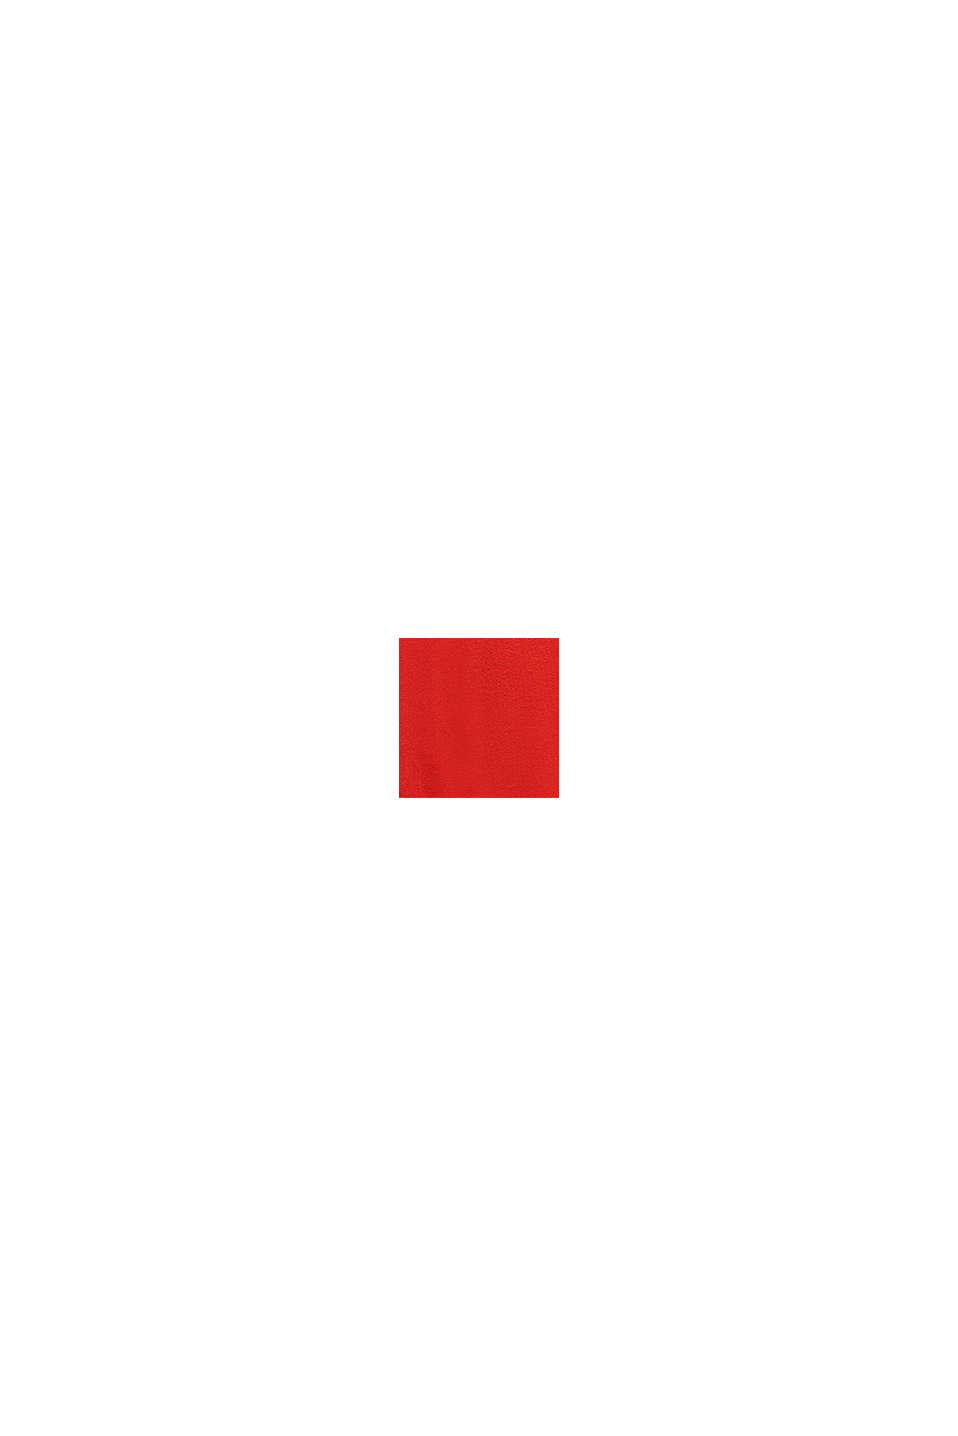 T-paita, jossa heijastava painatus, RED, swatch